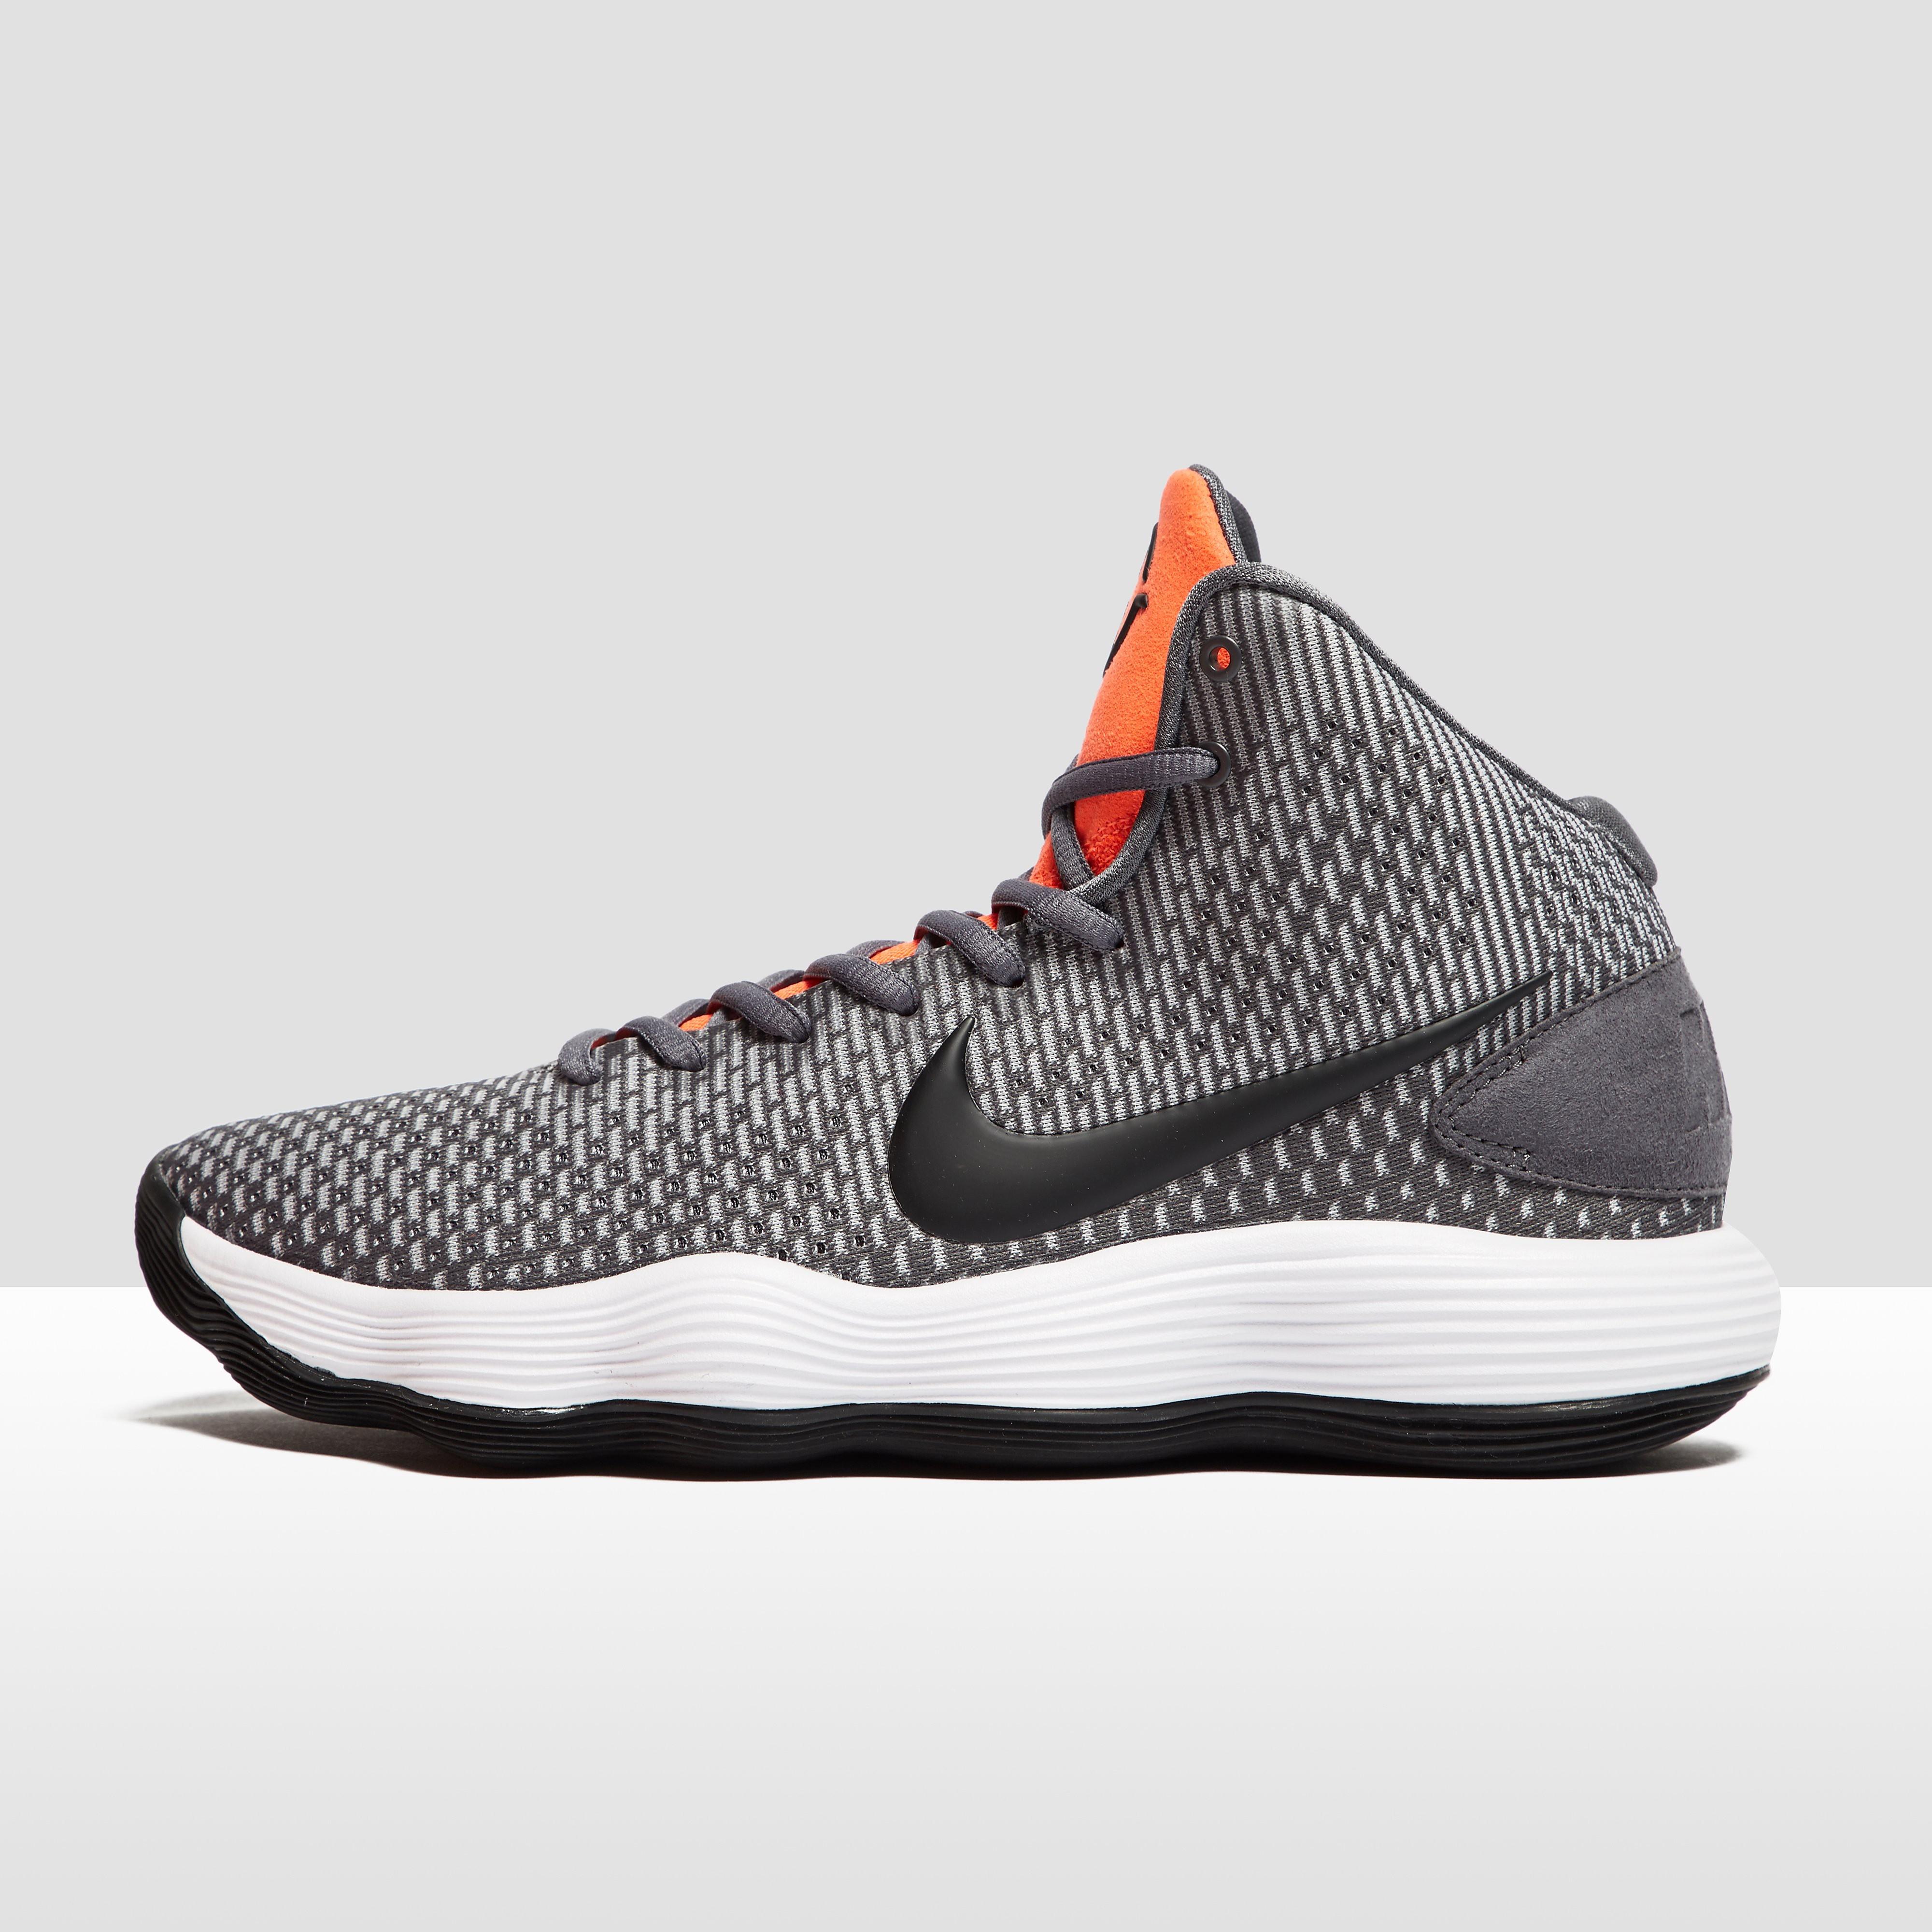 Nike Hyperdunk 2017 Men's Basketball Shoes